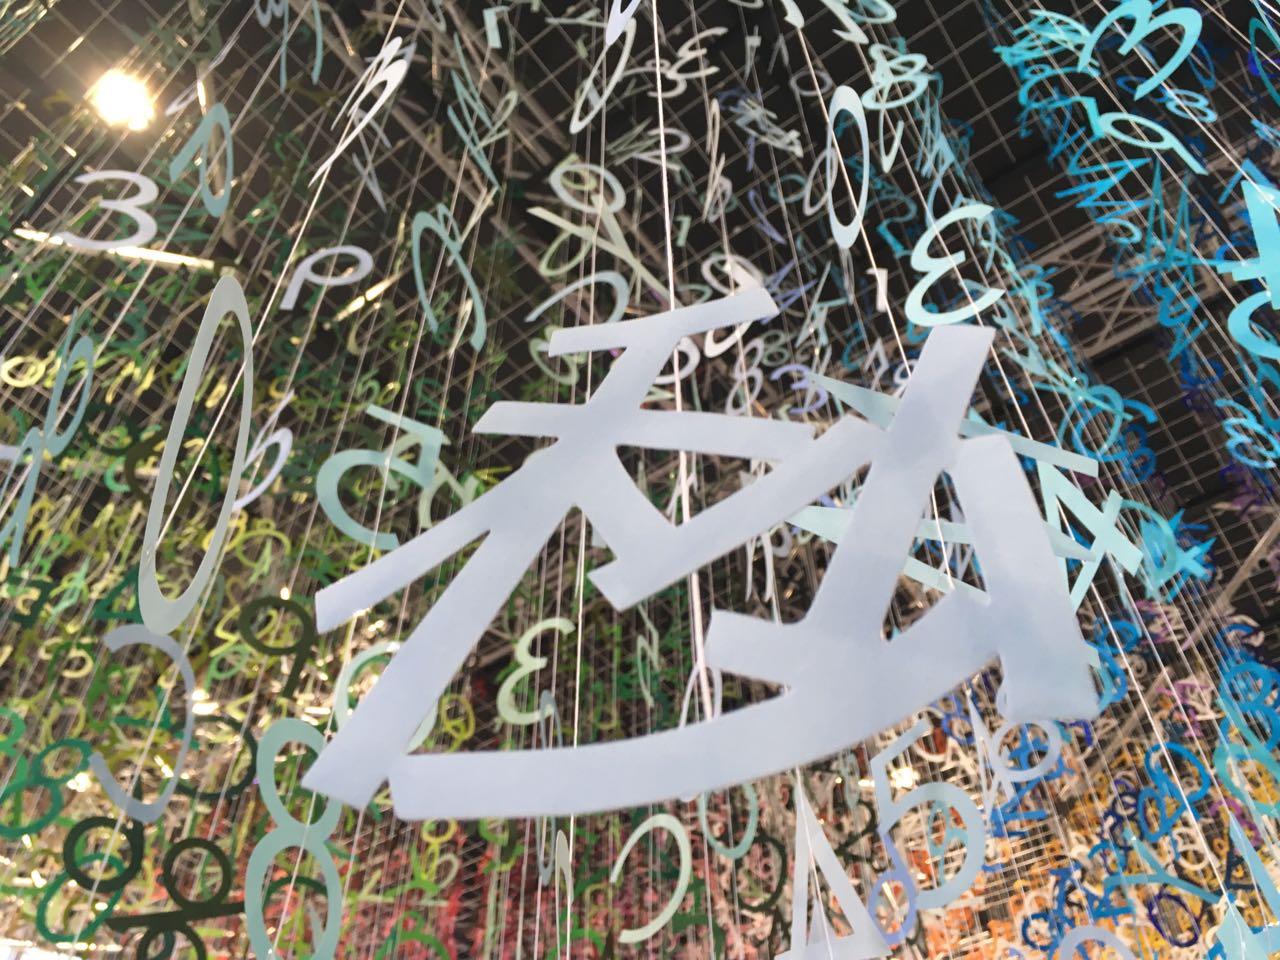 IMABARI Color Show, はーばりー, みとん今治, イベント, エマニュエル・ムホー, 今治タオル, 愛媛県繊維染色工業組合